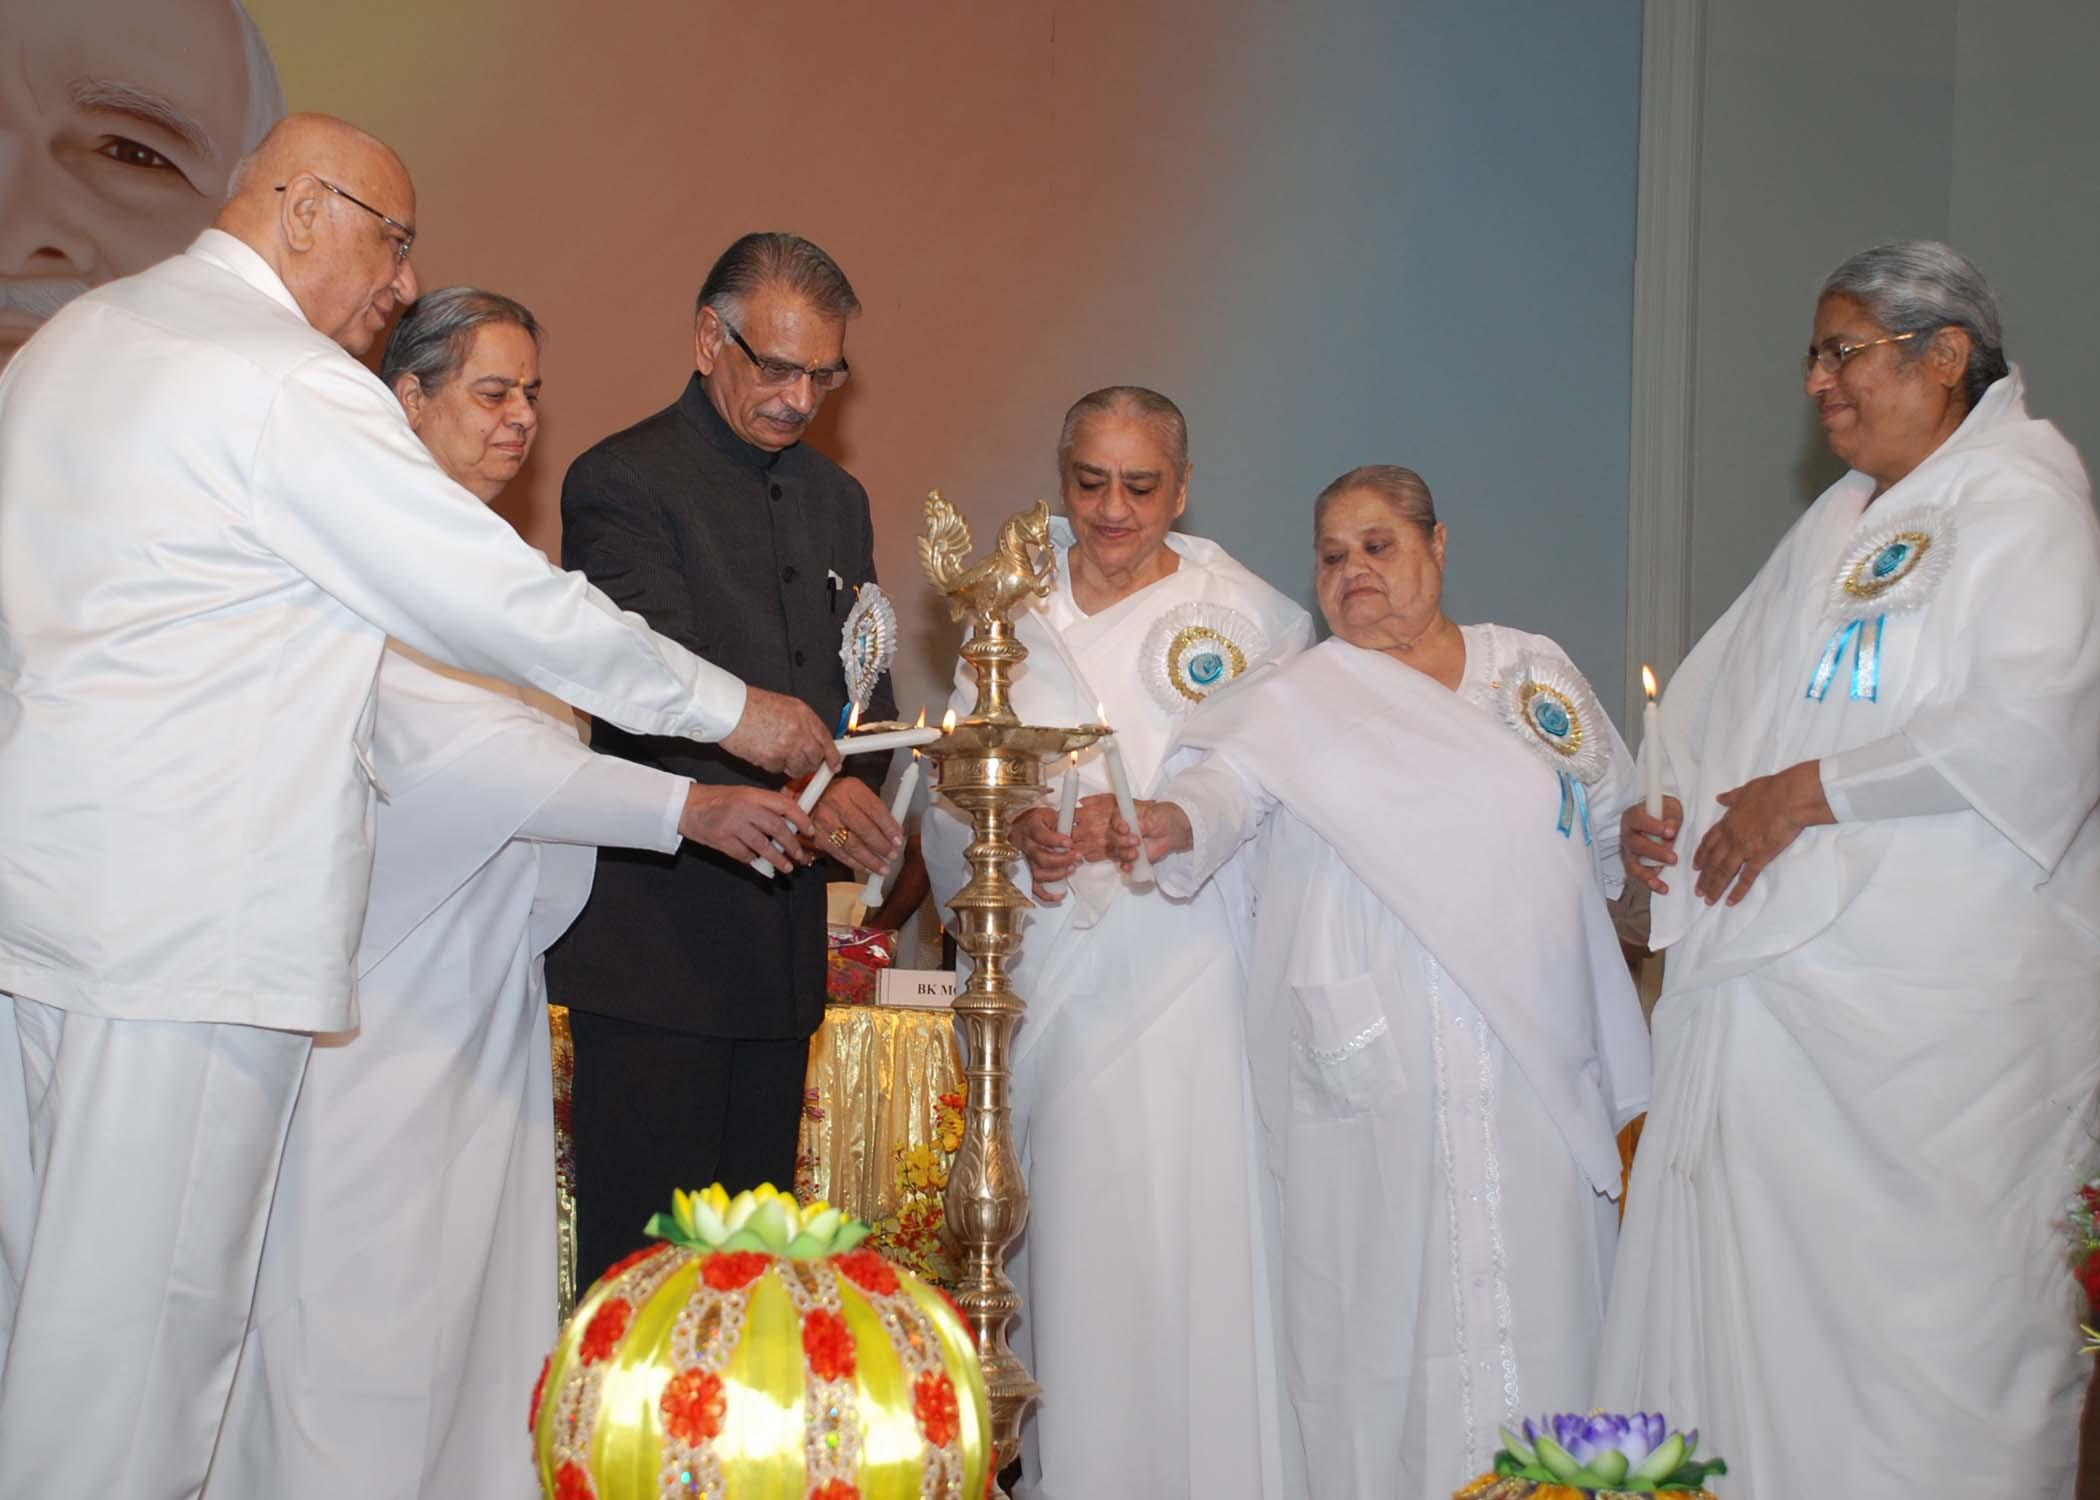 H.E.Shivraj Patil, Governor of Punjab Inaugurates 'One God, One World One Family' Programme at ORC, Delhi